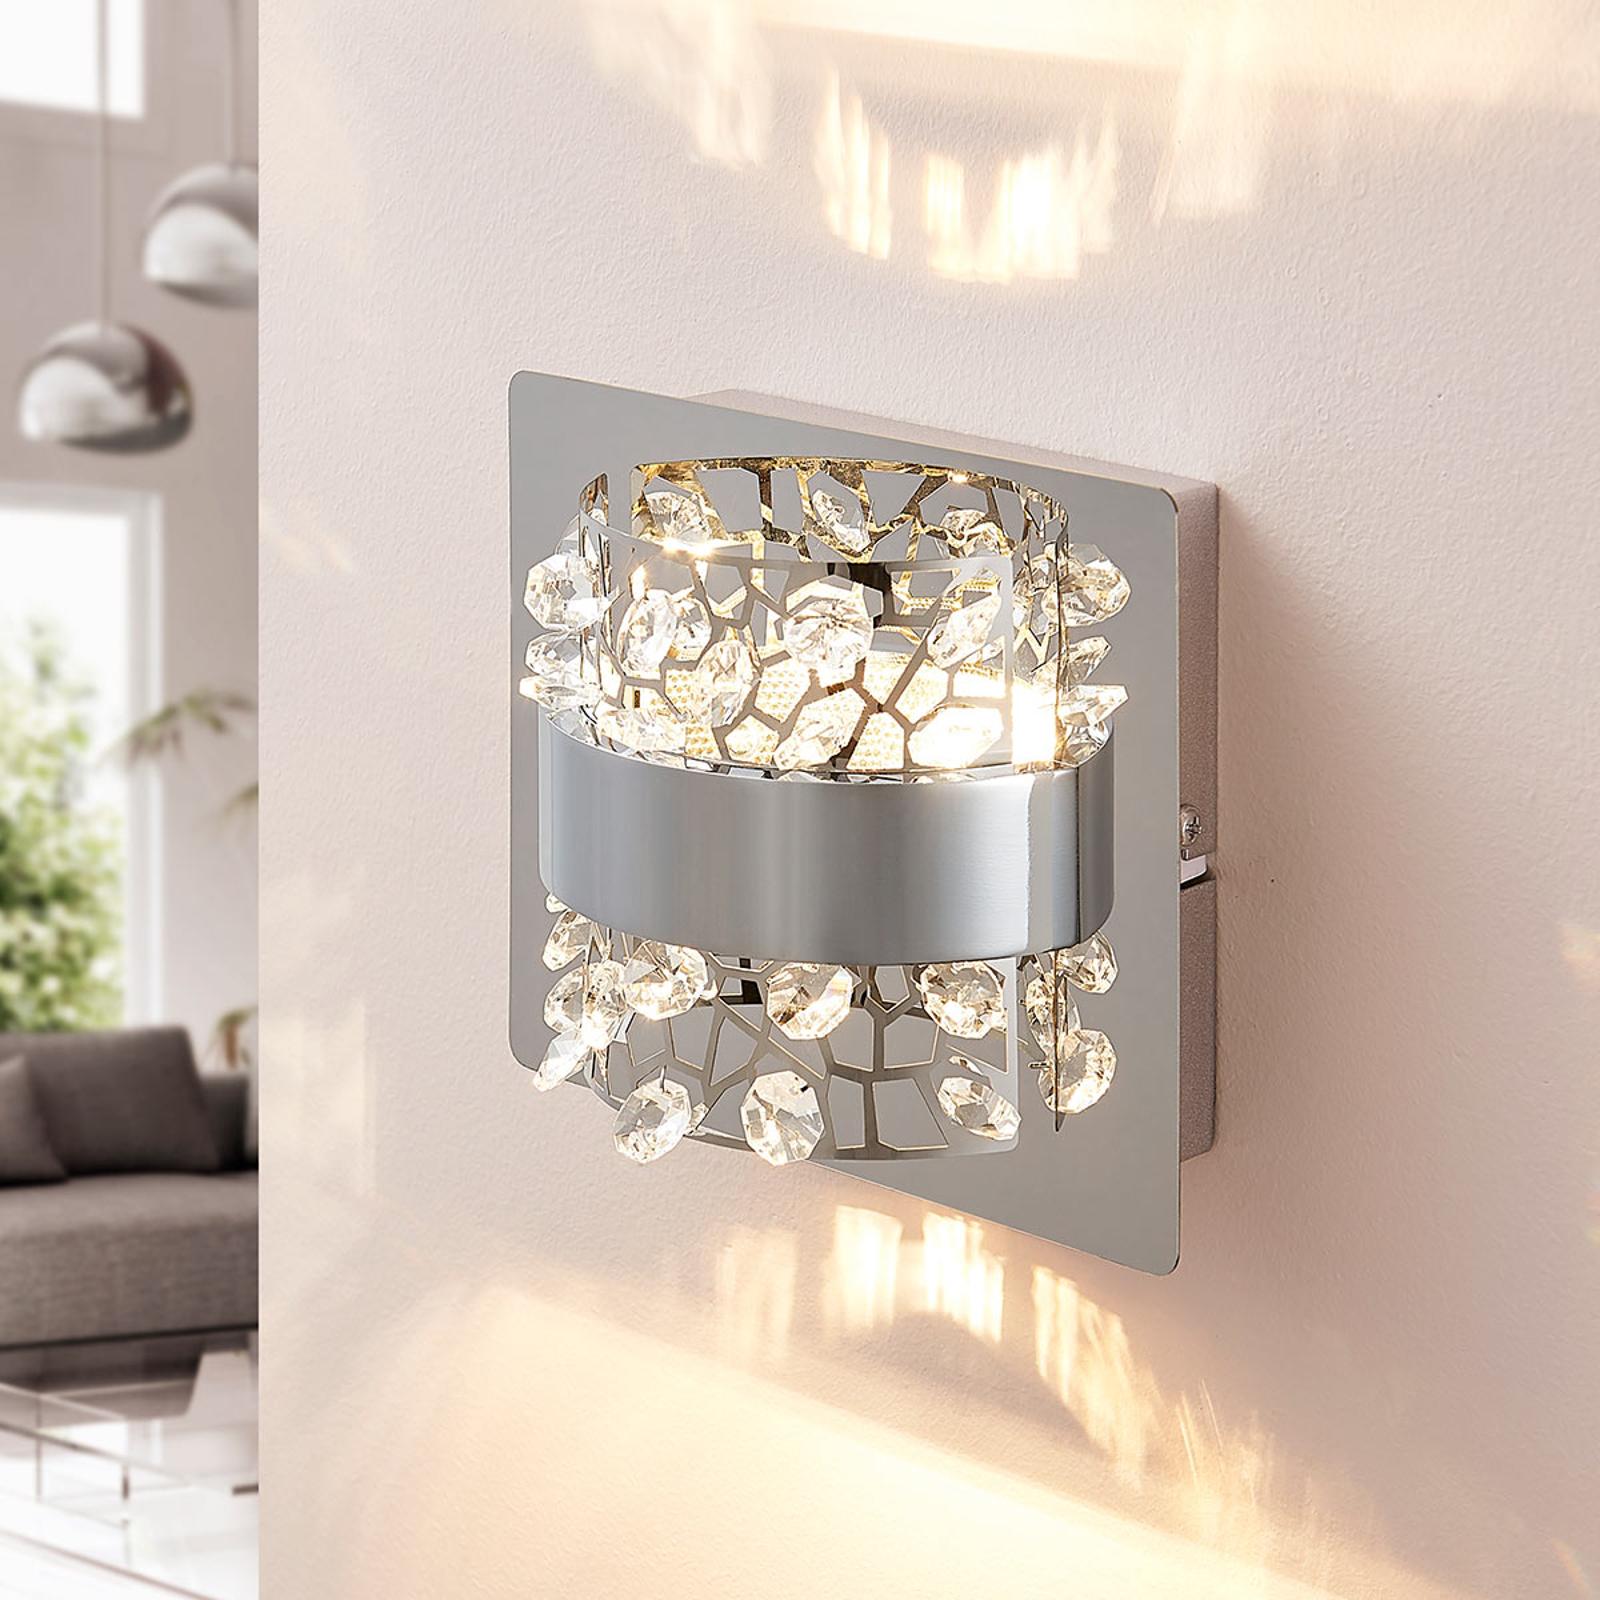 LED-Wandlampe Neelie mit Glassteinen, 1-flammig